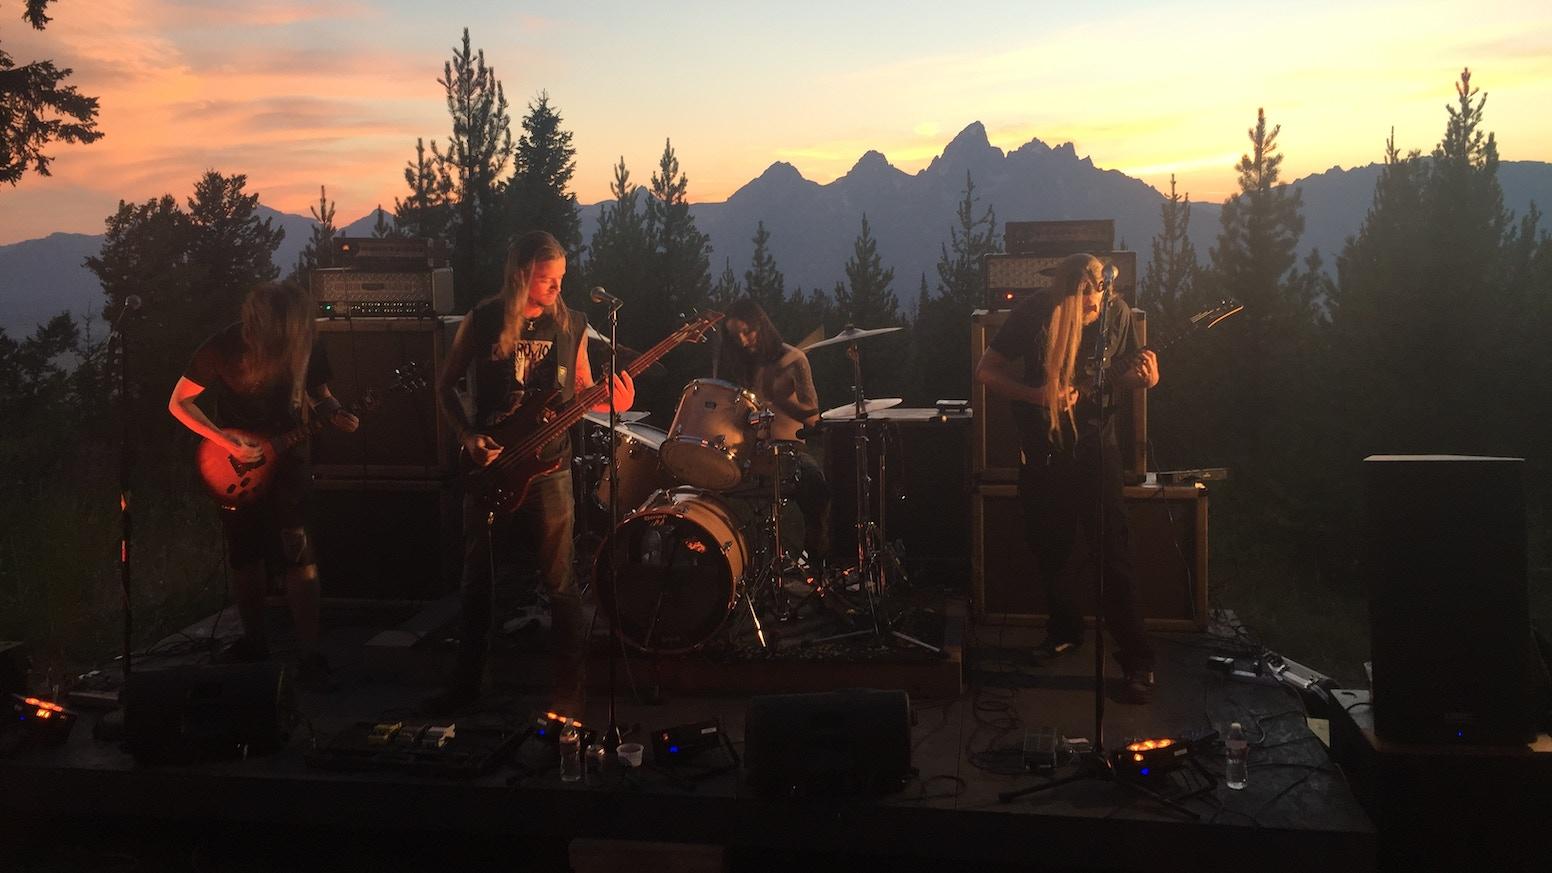 fire in the mountains by heavy metal massacre kickstarter